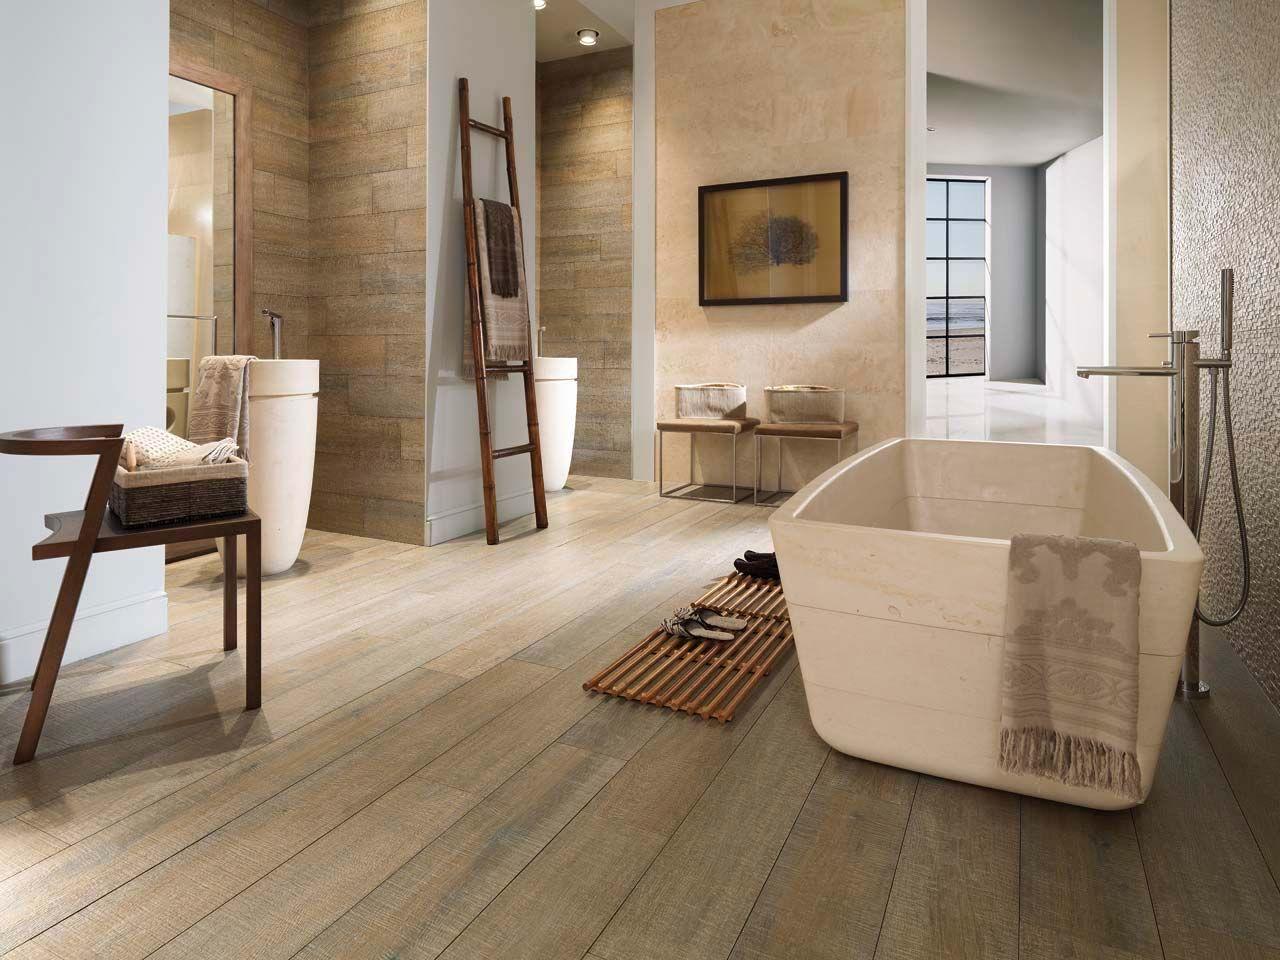 keramisch parket vloer pinterest parket badkamer en hout